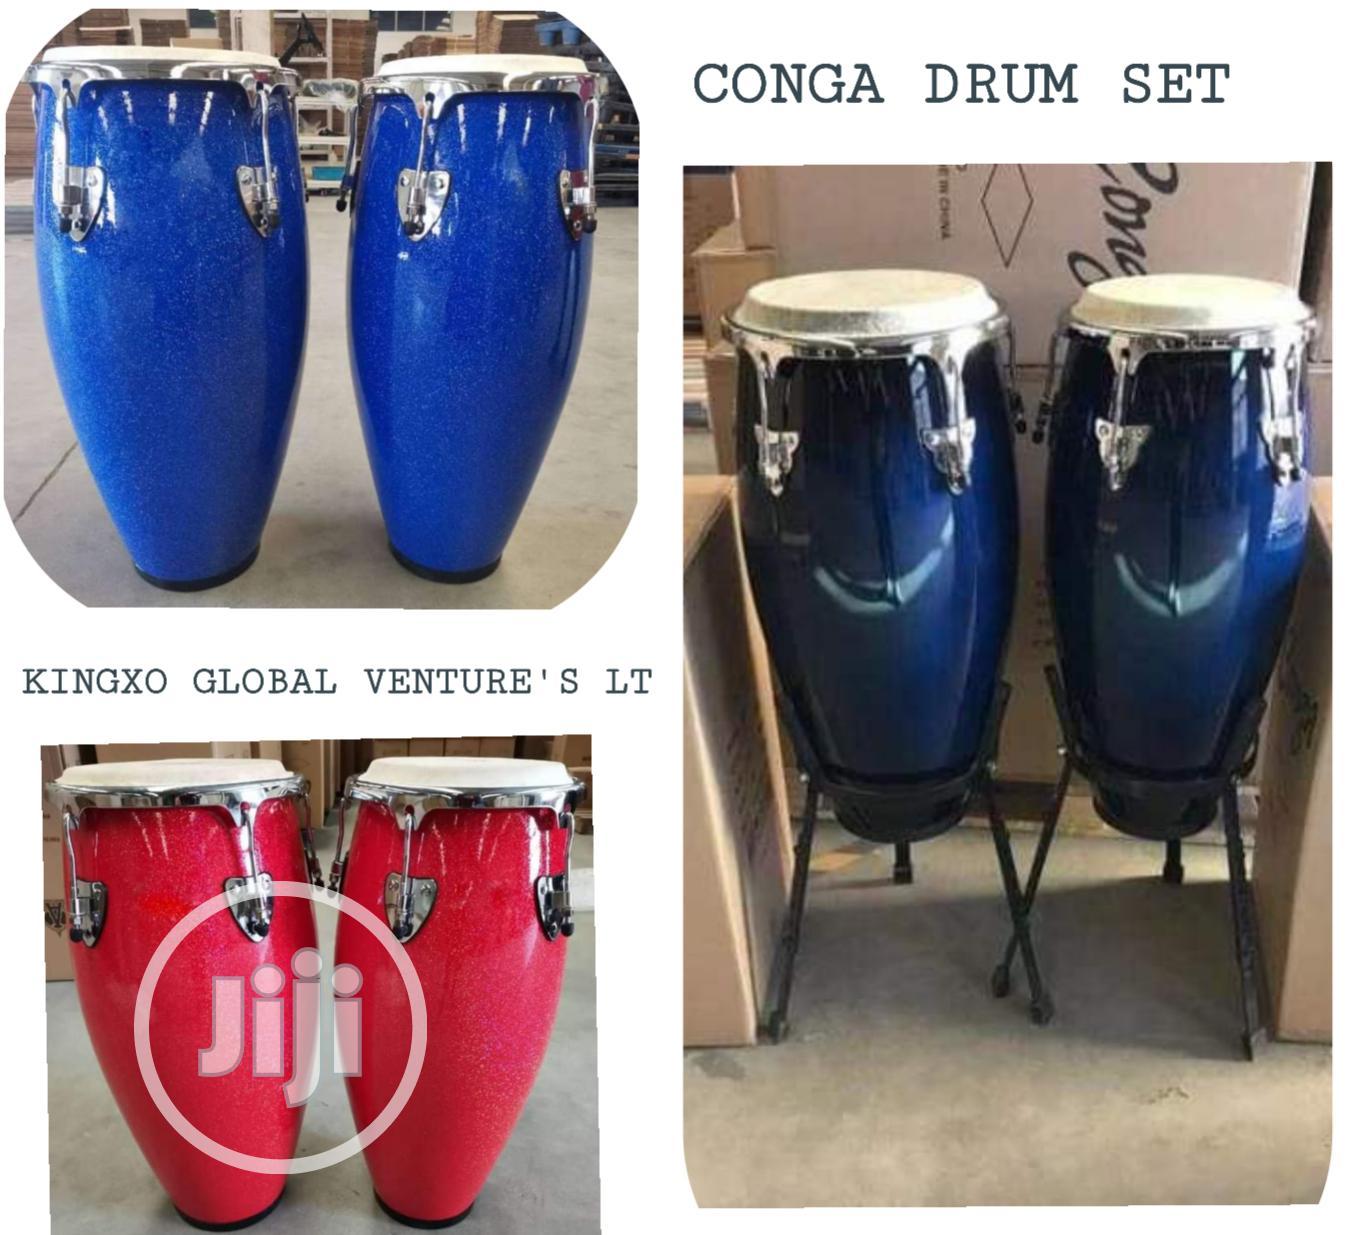 Conga Drum Set